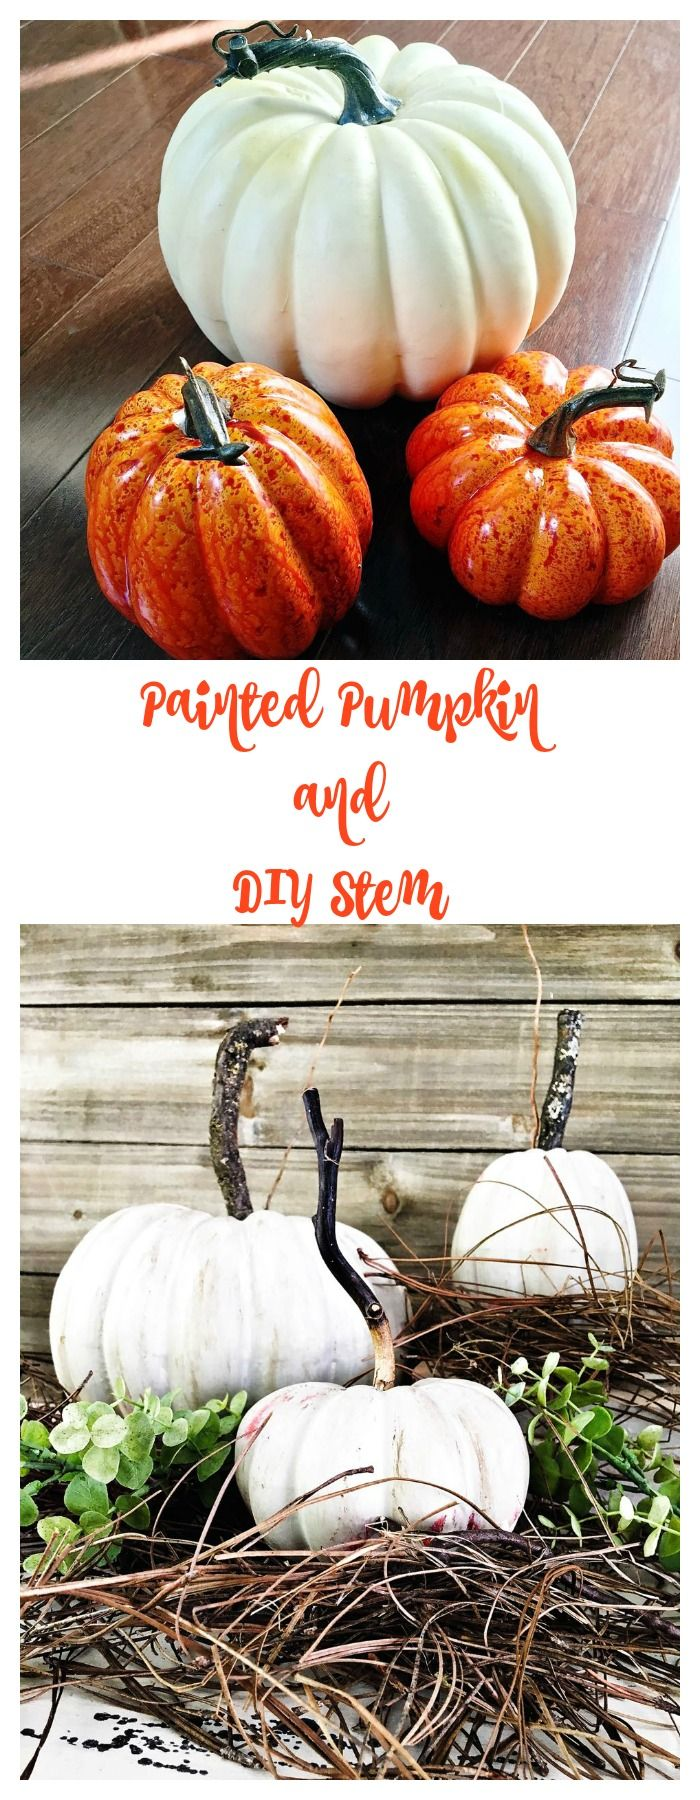 Pumpkin stems for crafts - Pumpkin Stems For Crafts Pumpkin Stems For Crafts 16 Download